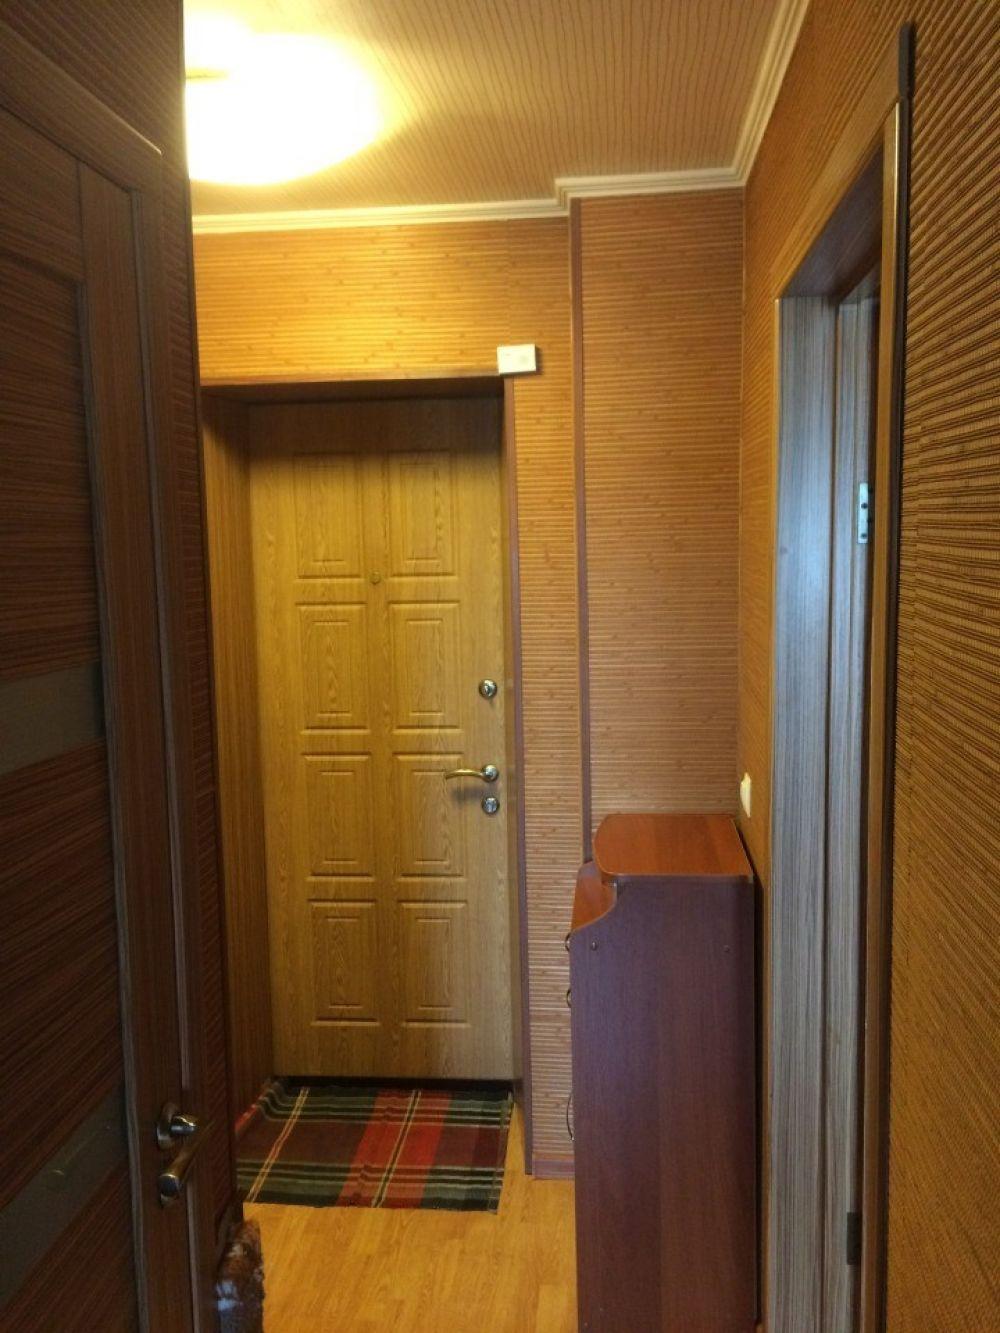 1-комнатная квартира поселок Свердловский ул.Заводская д.1, фото 8